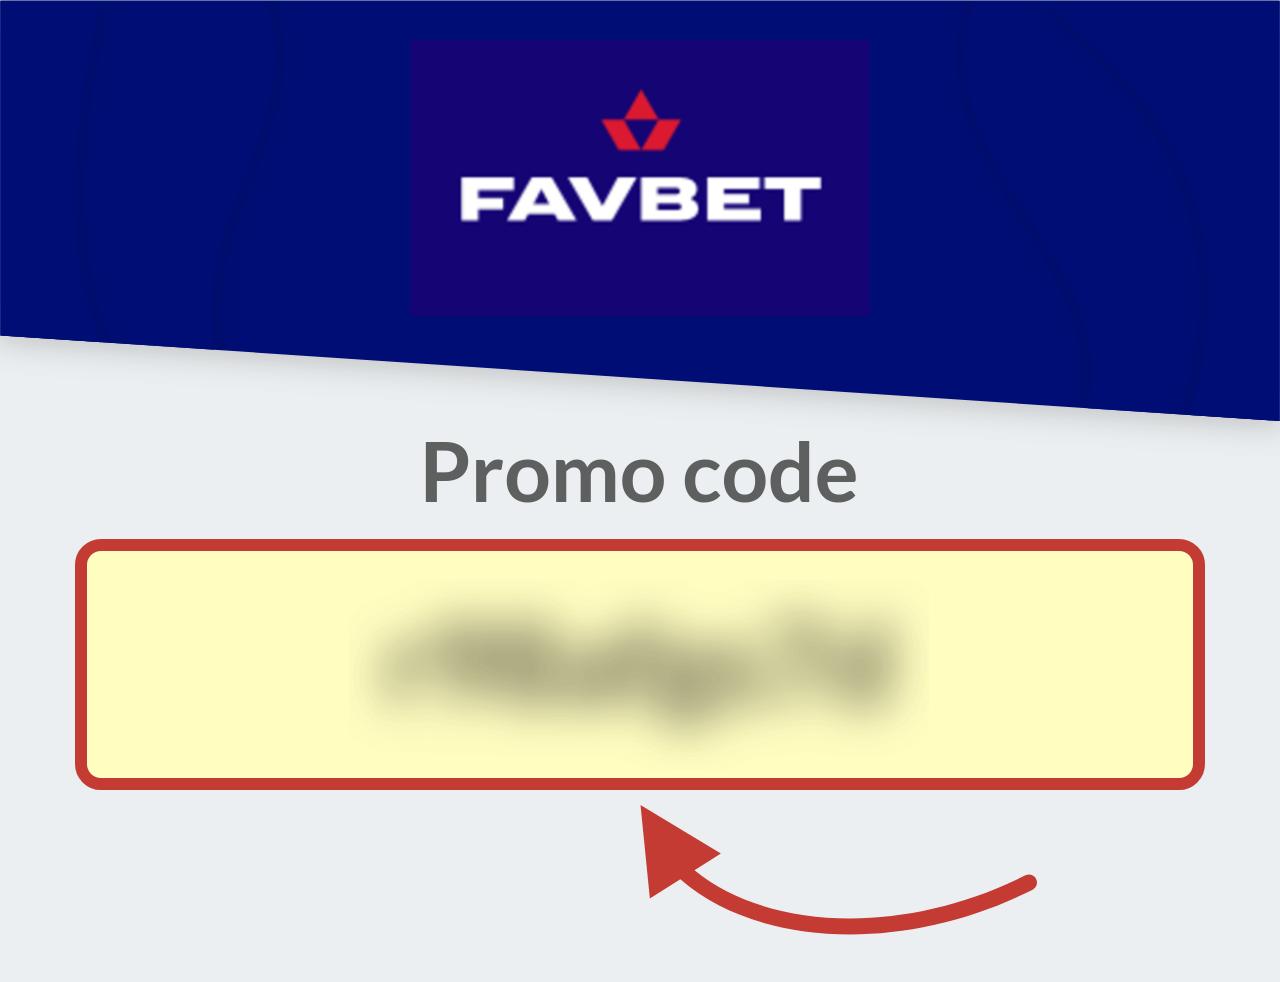 FavBet Promo Code